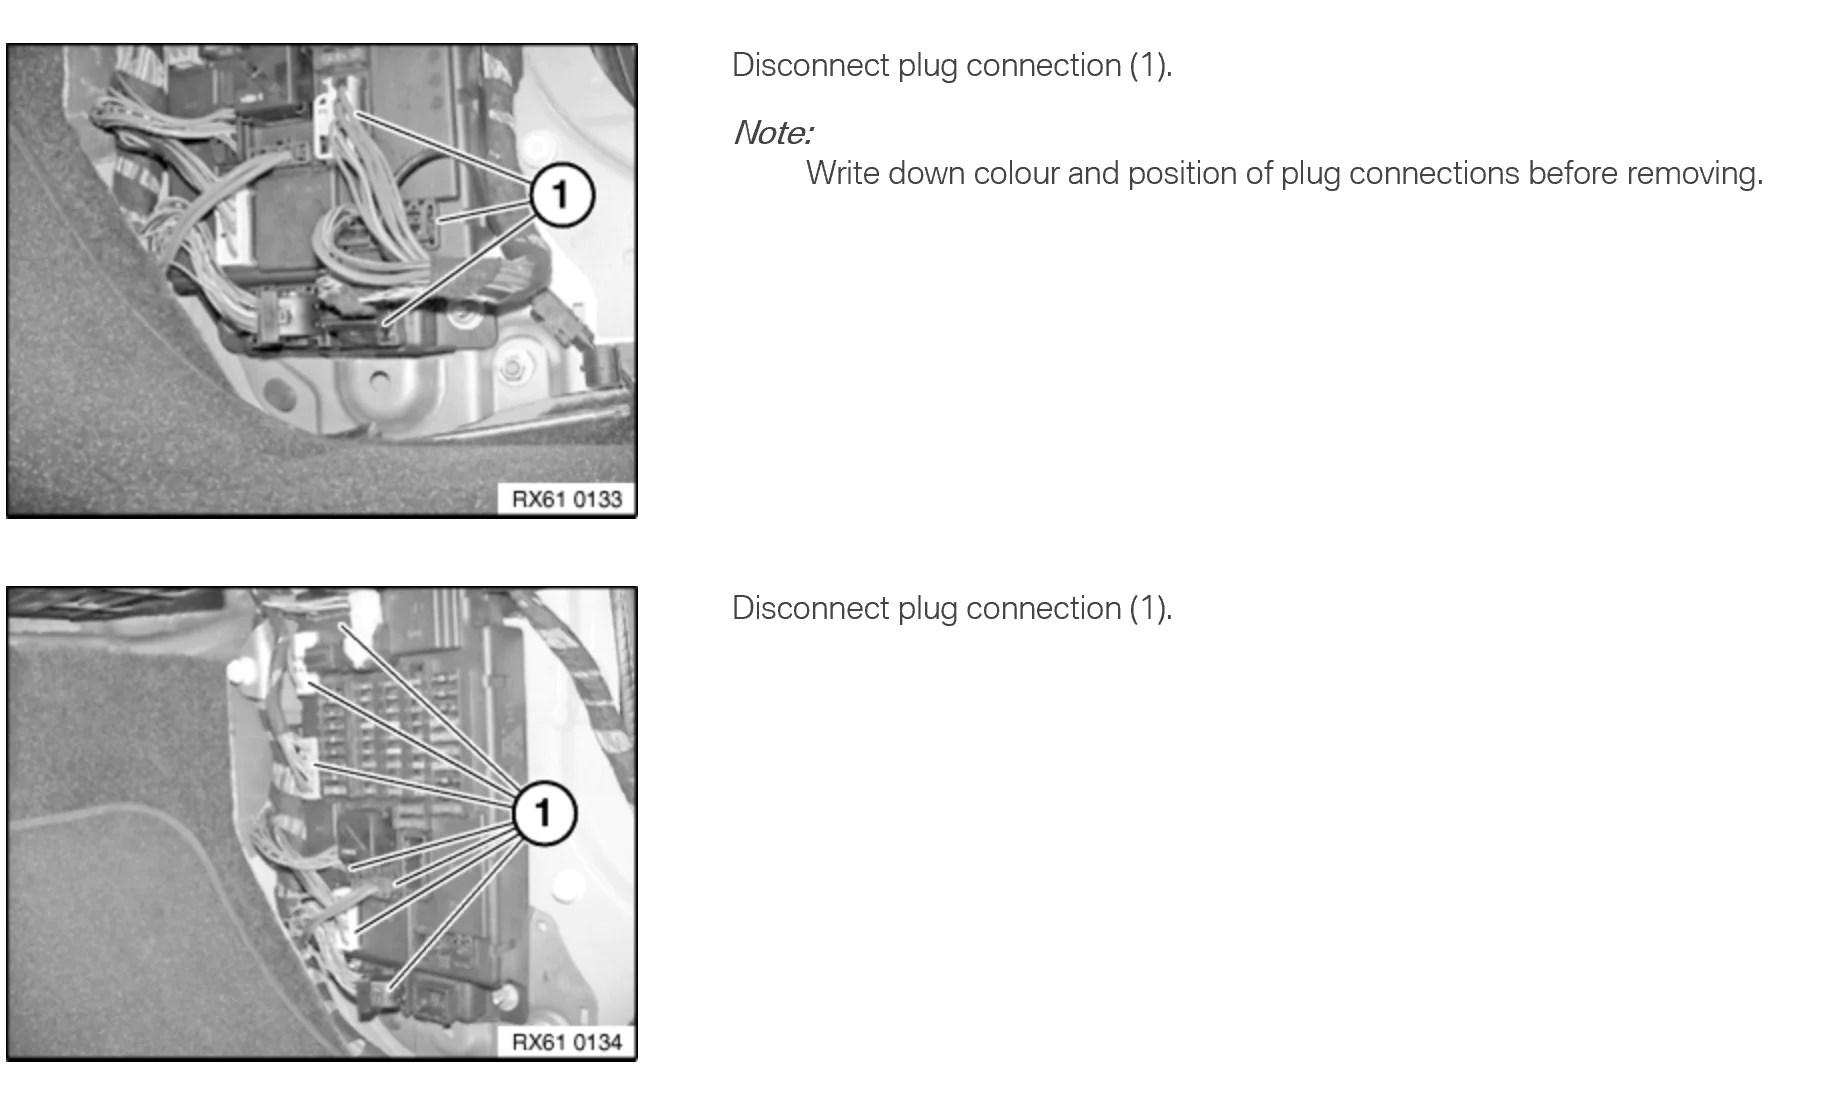 mini cooper r56 r58 r60 all r series fuse box speg removal instructions [ 1828 x 1094 Pixel ]